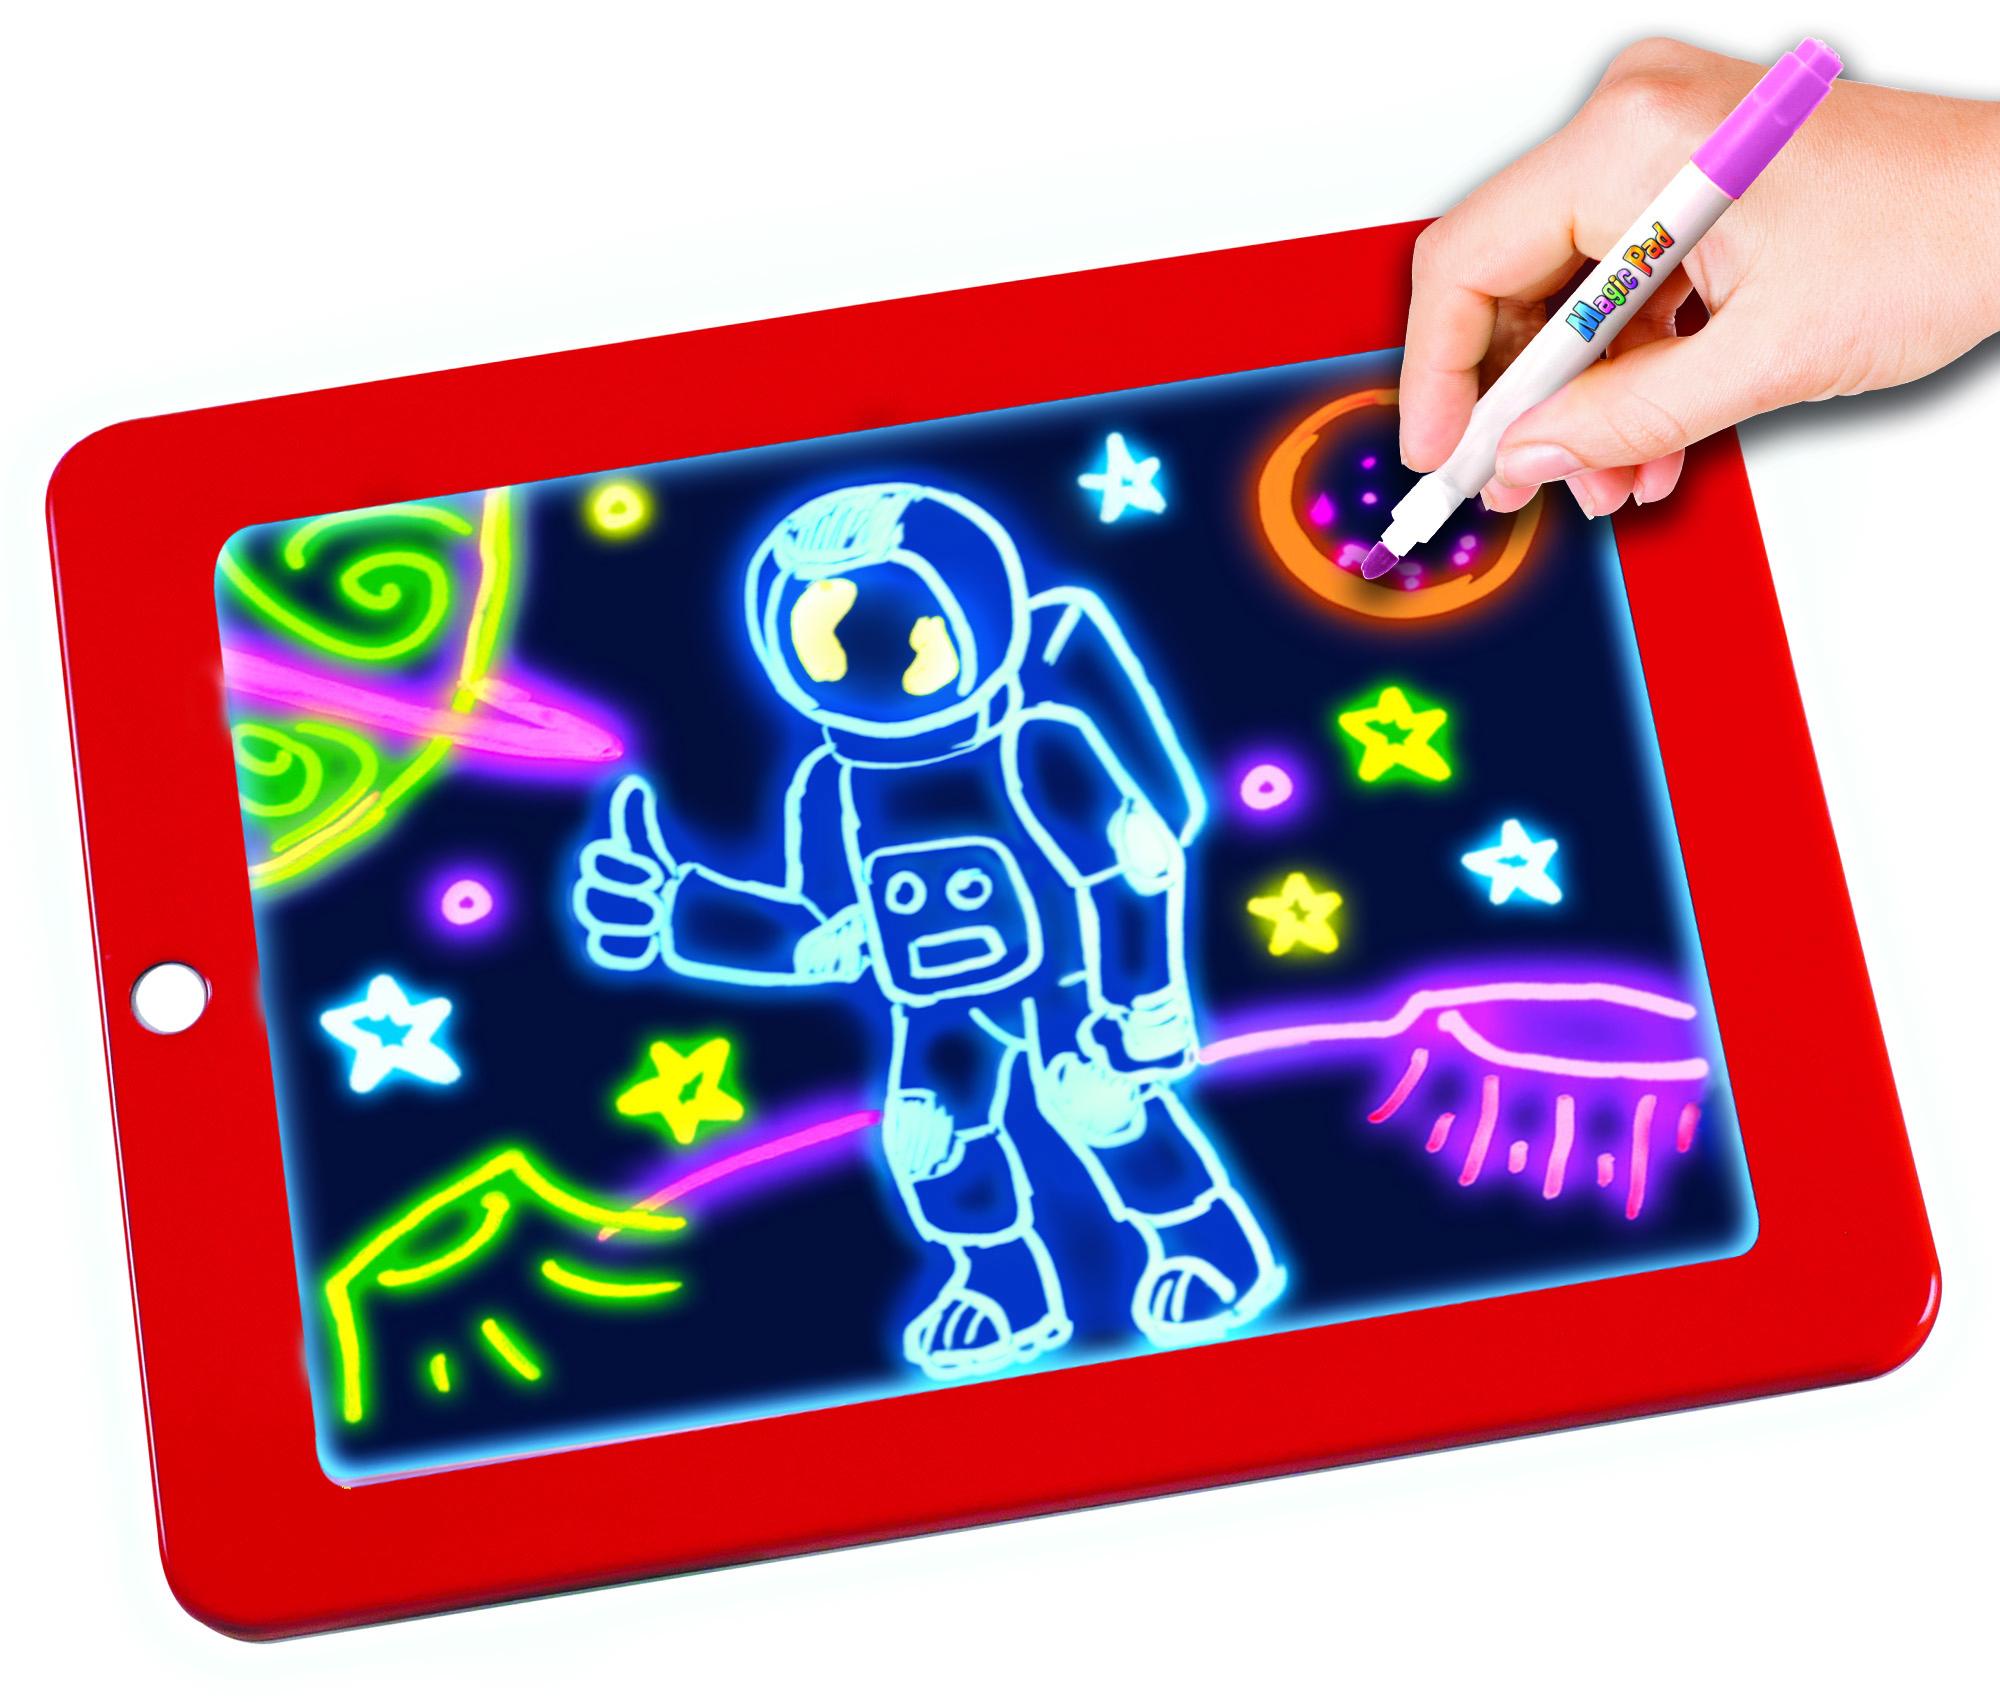 MagicPad™